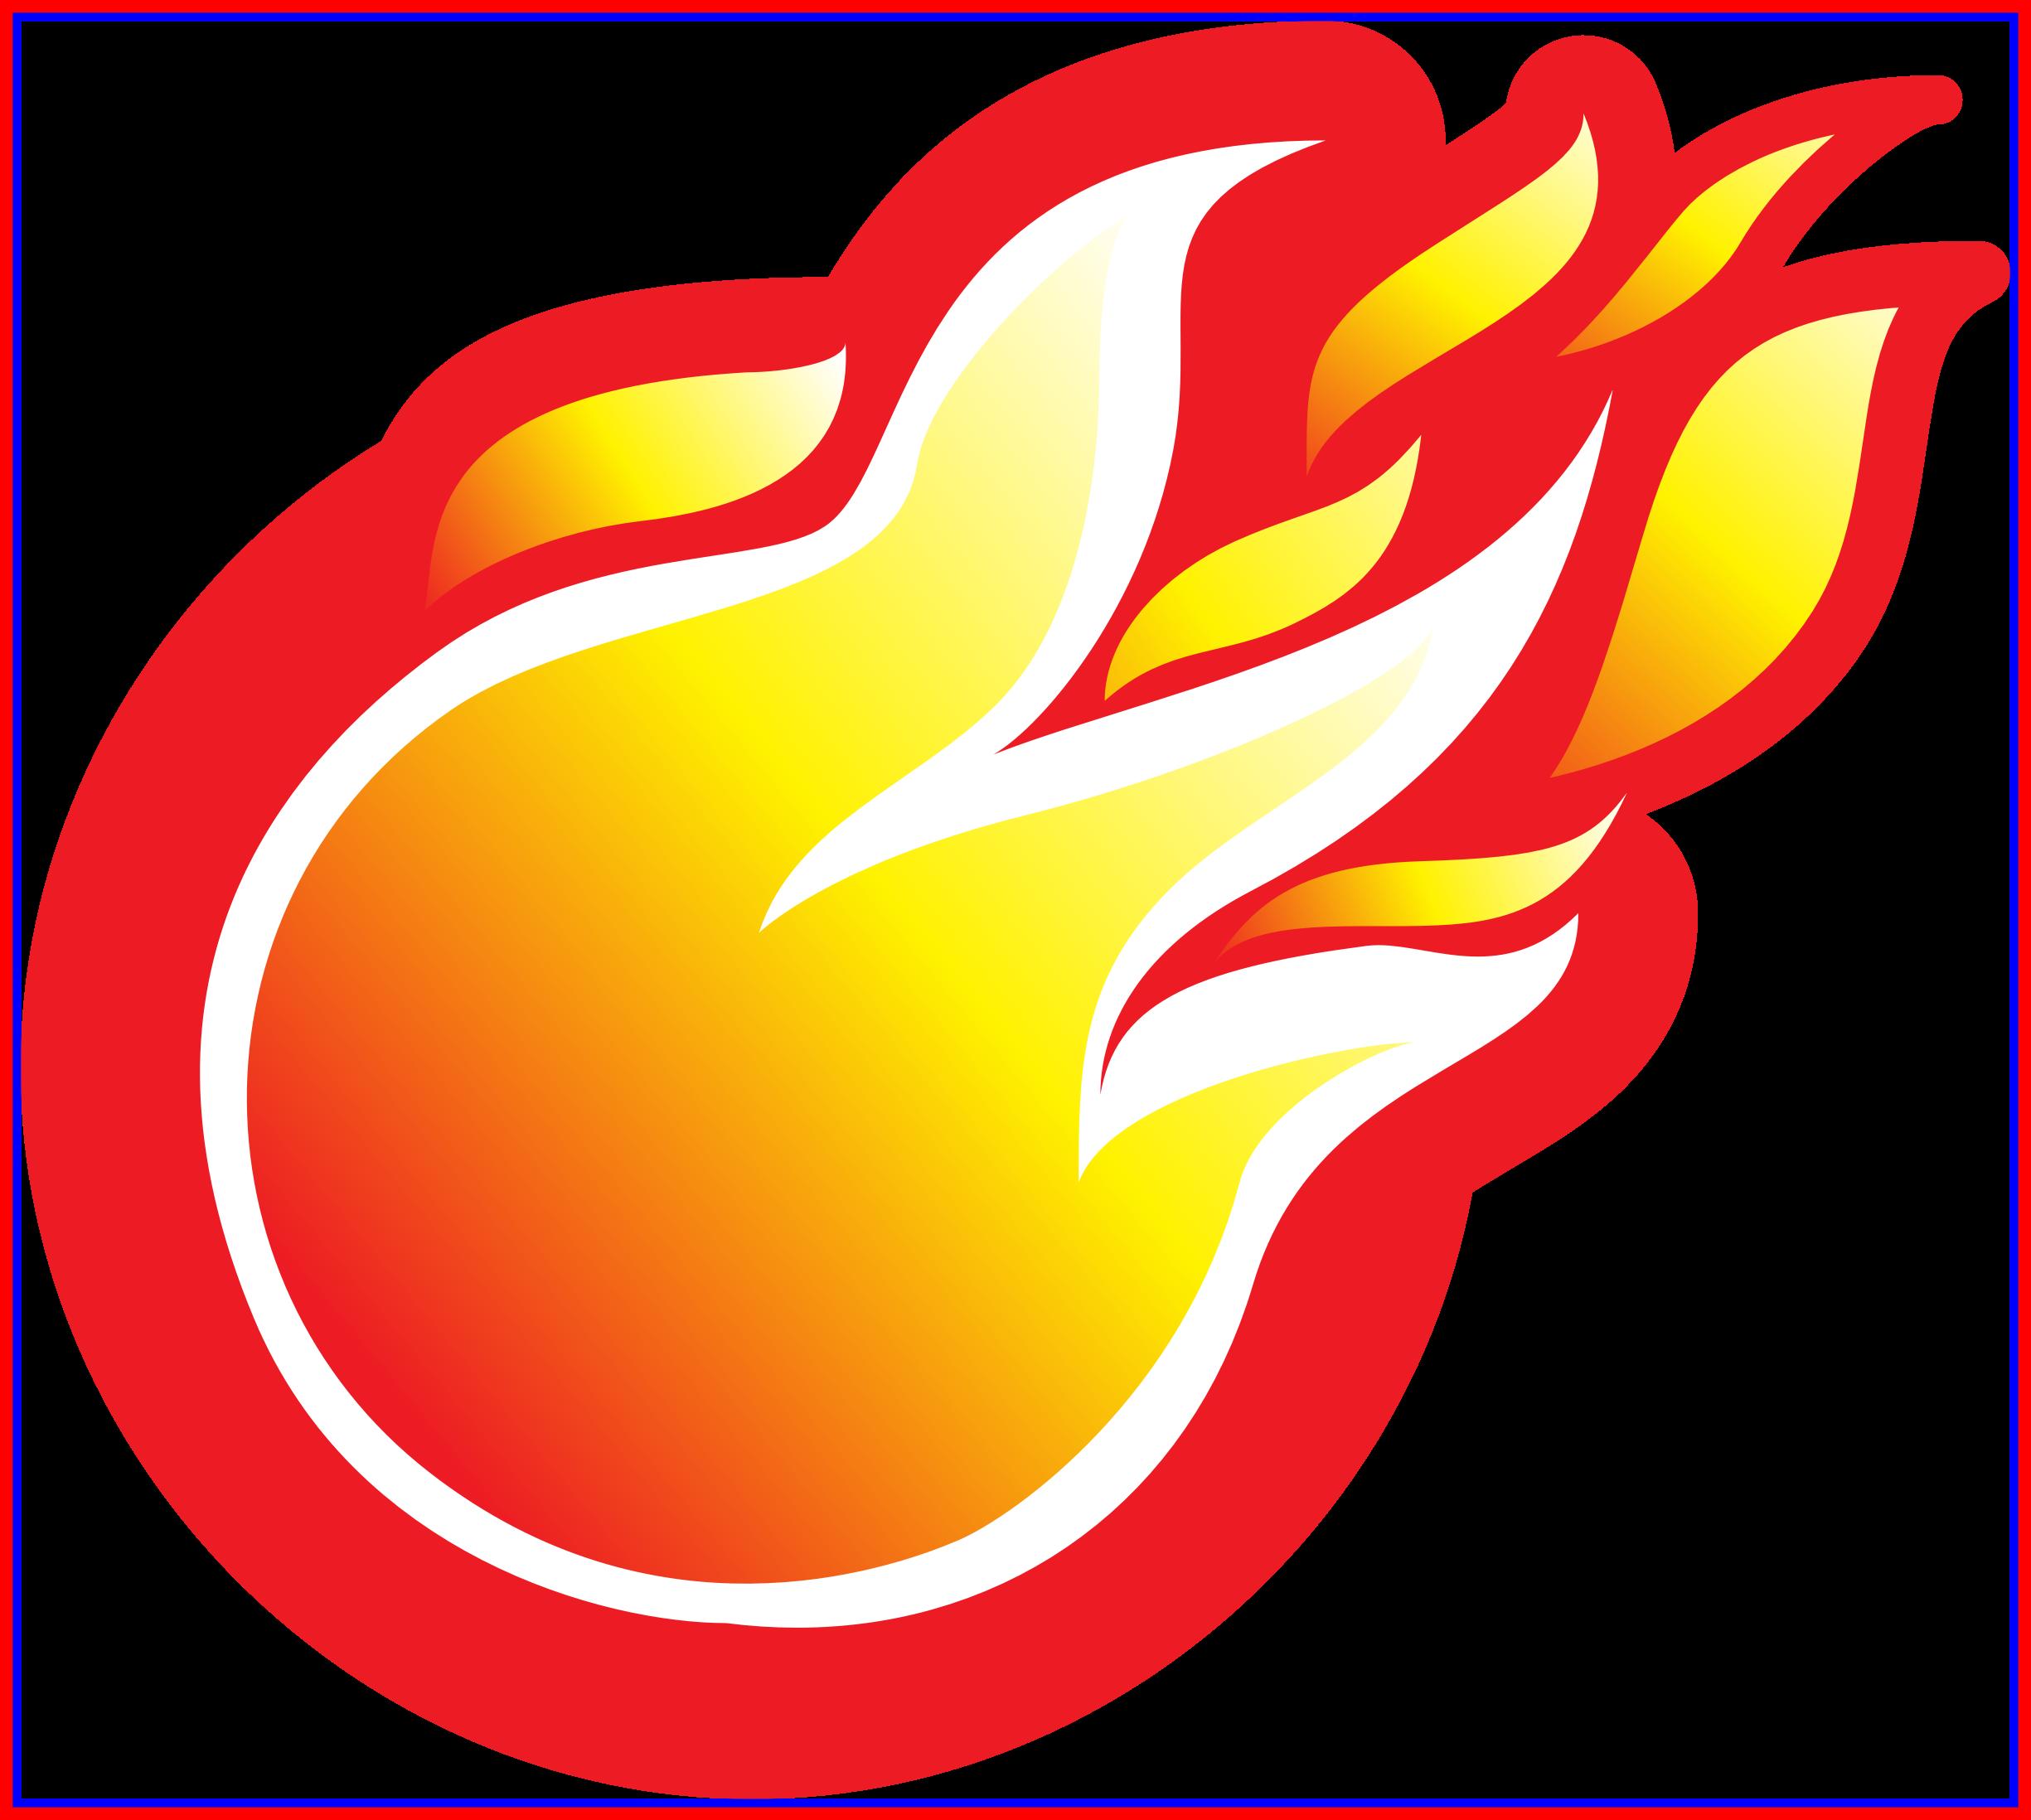 Fire clipart logo.  ideas of dove